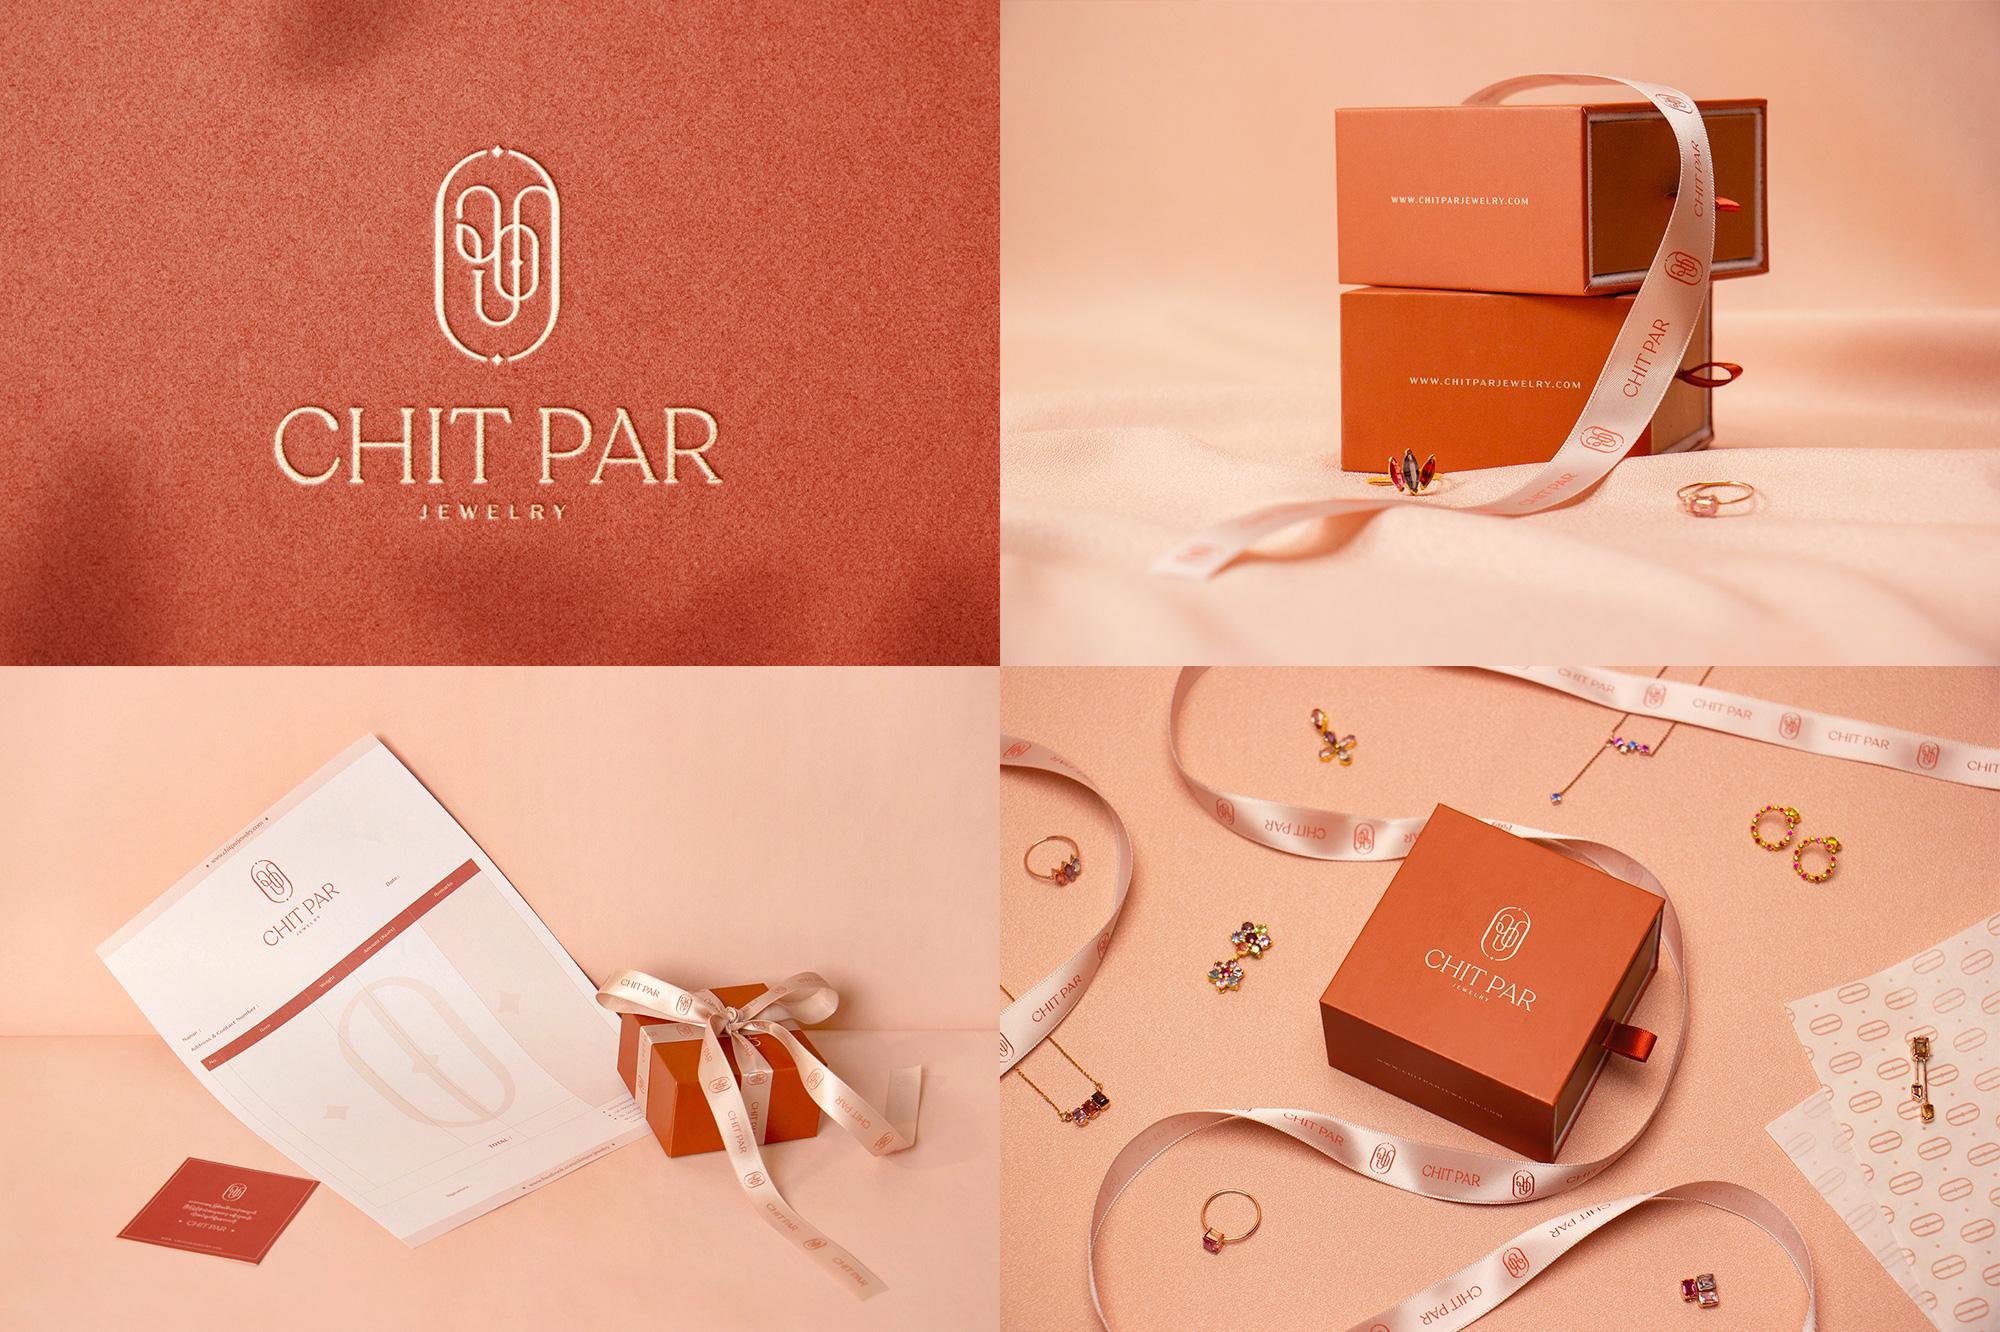 Chit Par Jewelry by Poke.